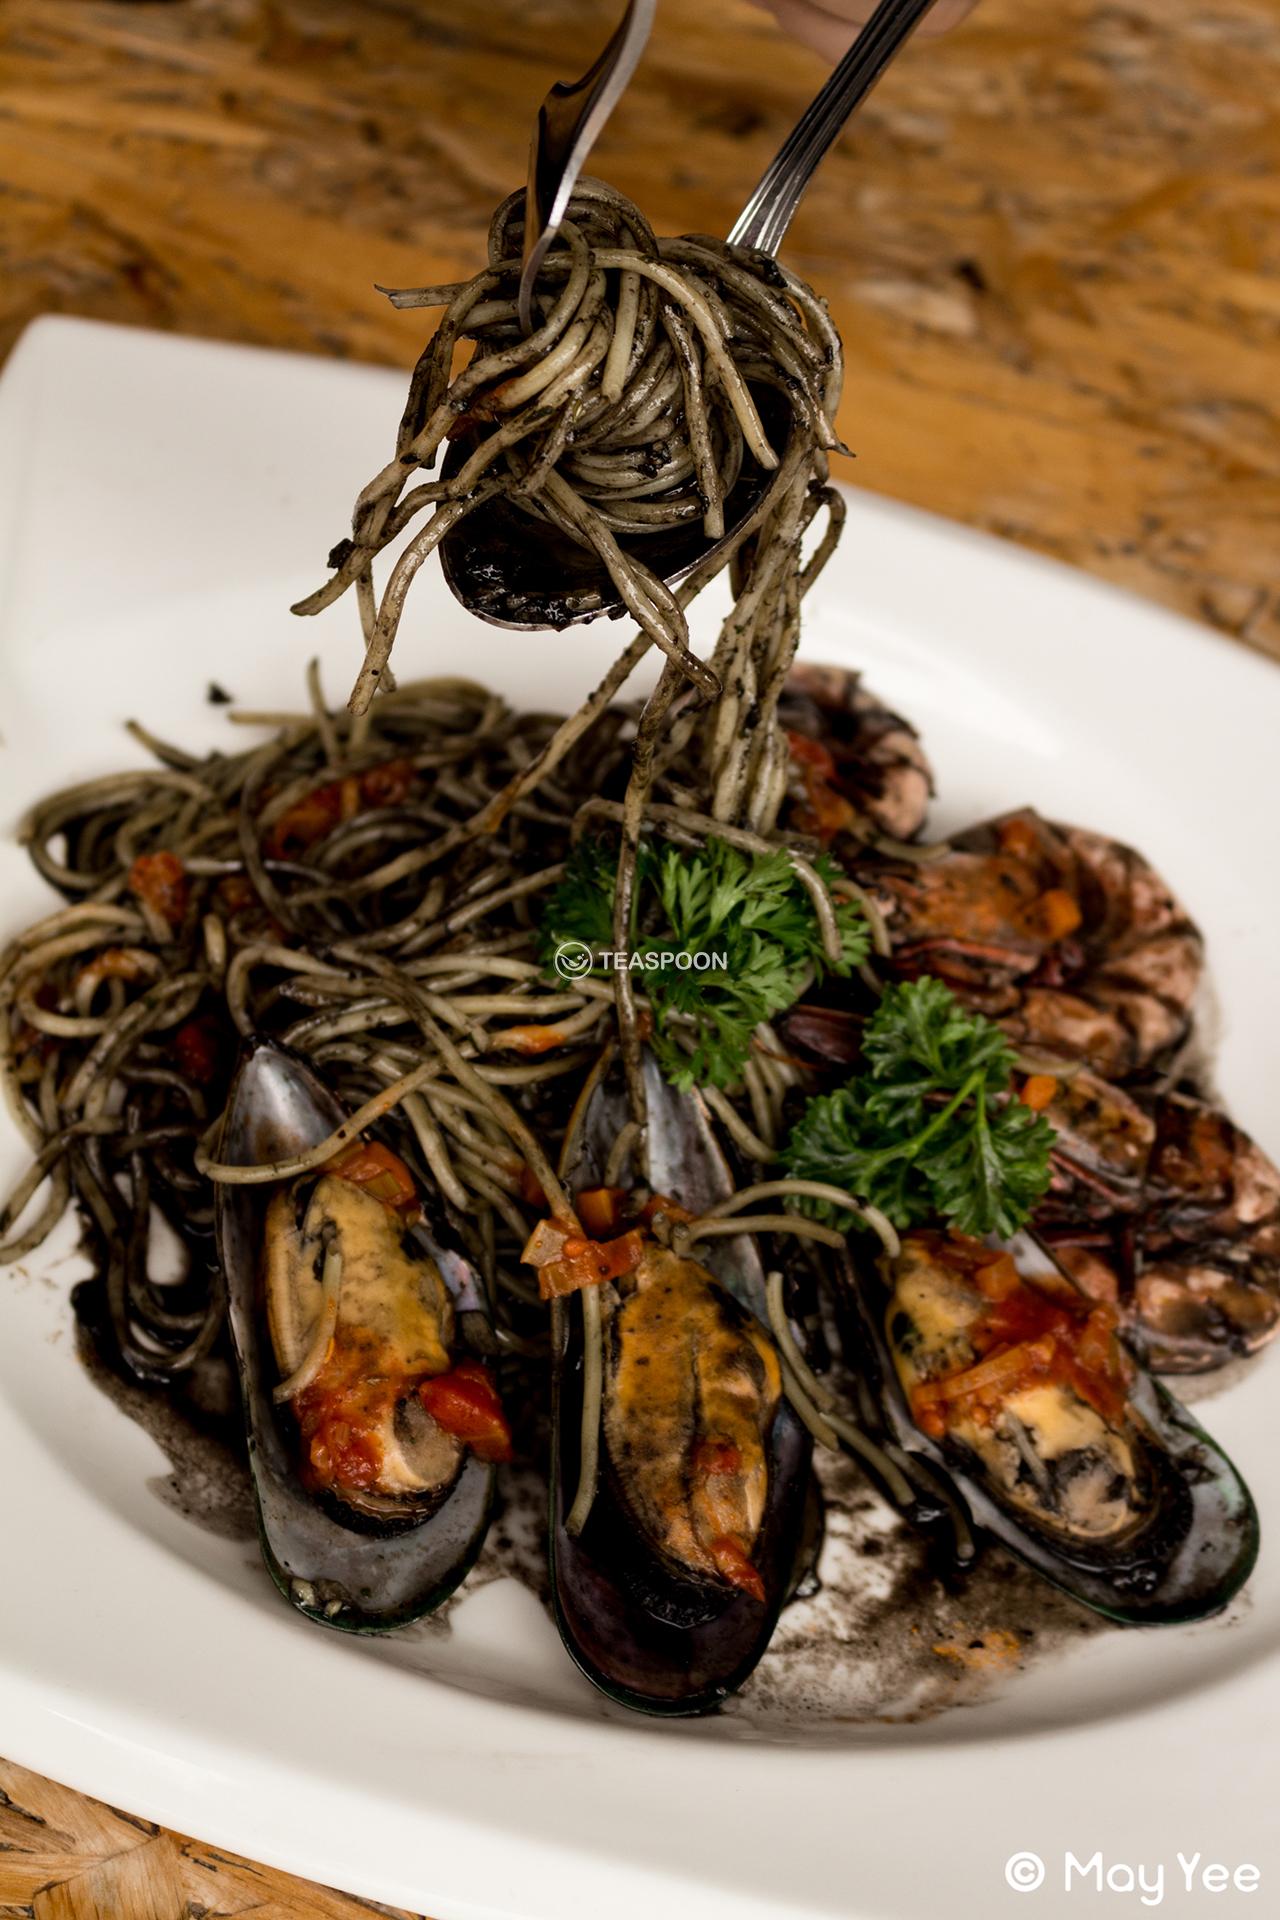 [Squid Ink Seafood Pasta]